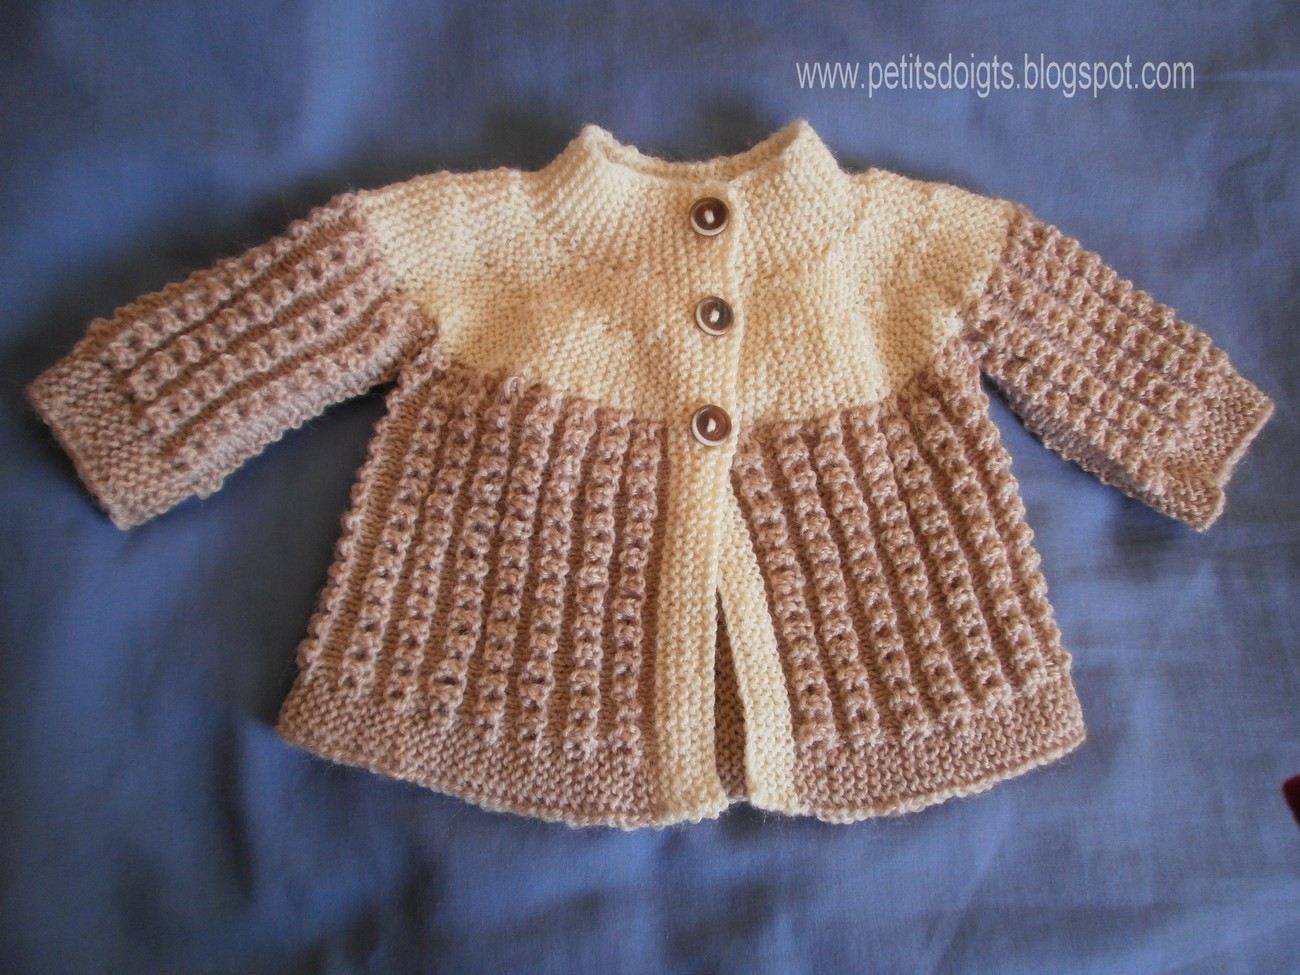 Tricoter brassiere en rangs raccourcis